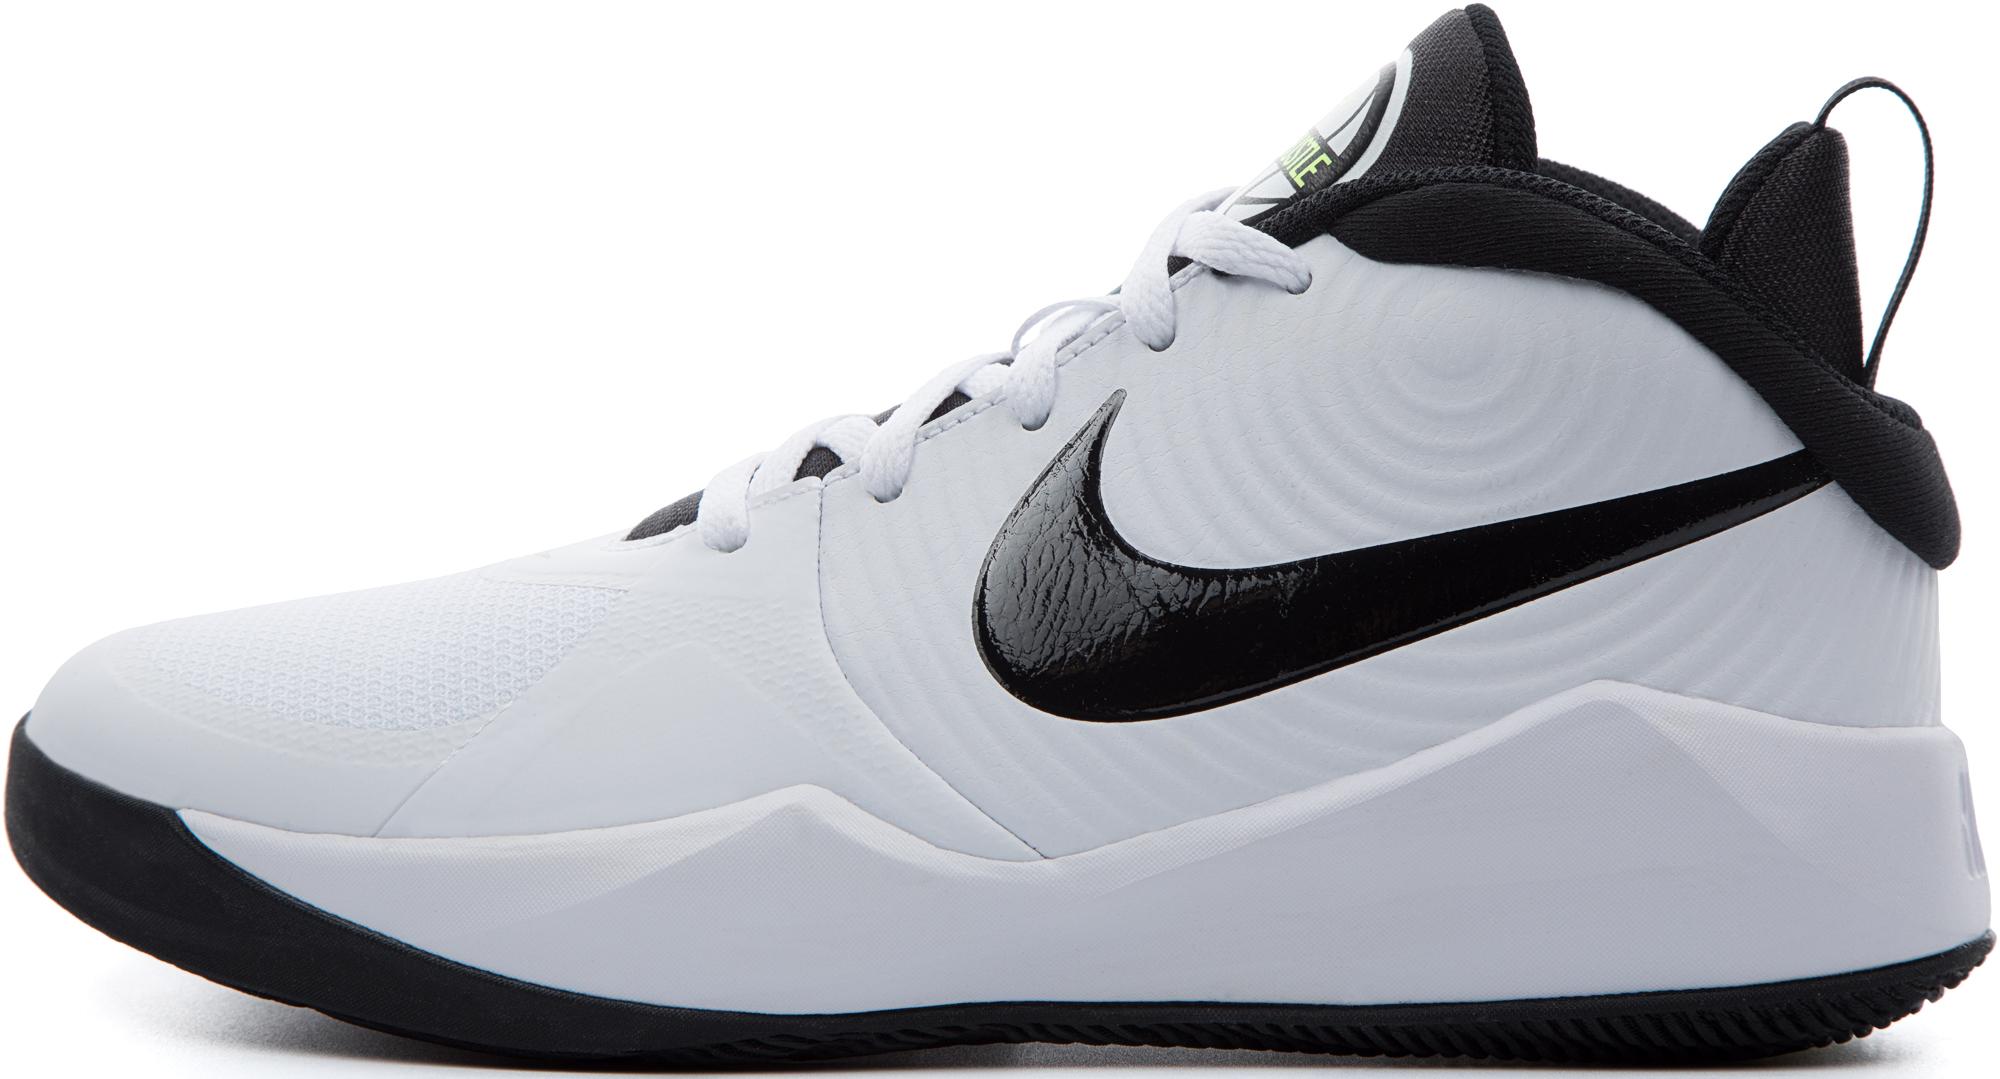 Nike Кроссовки для мальчиков Team Hustle D 9, размер 36,5